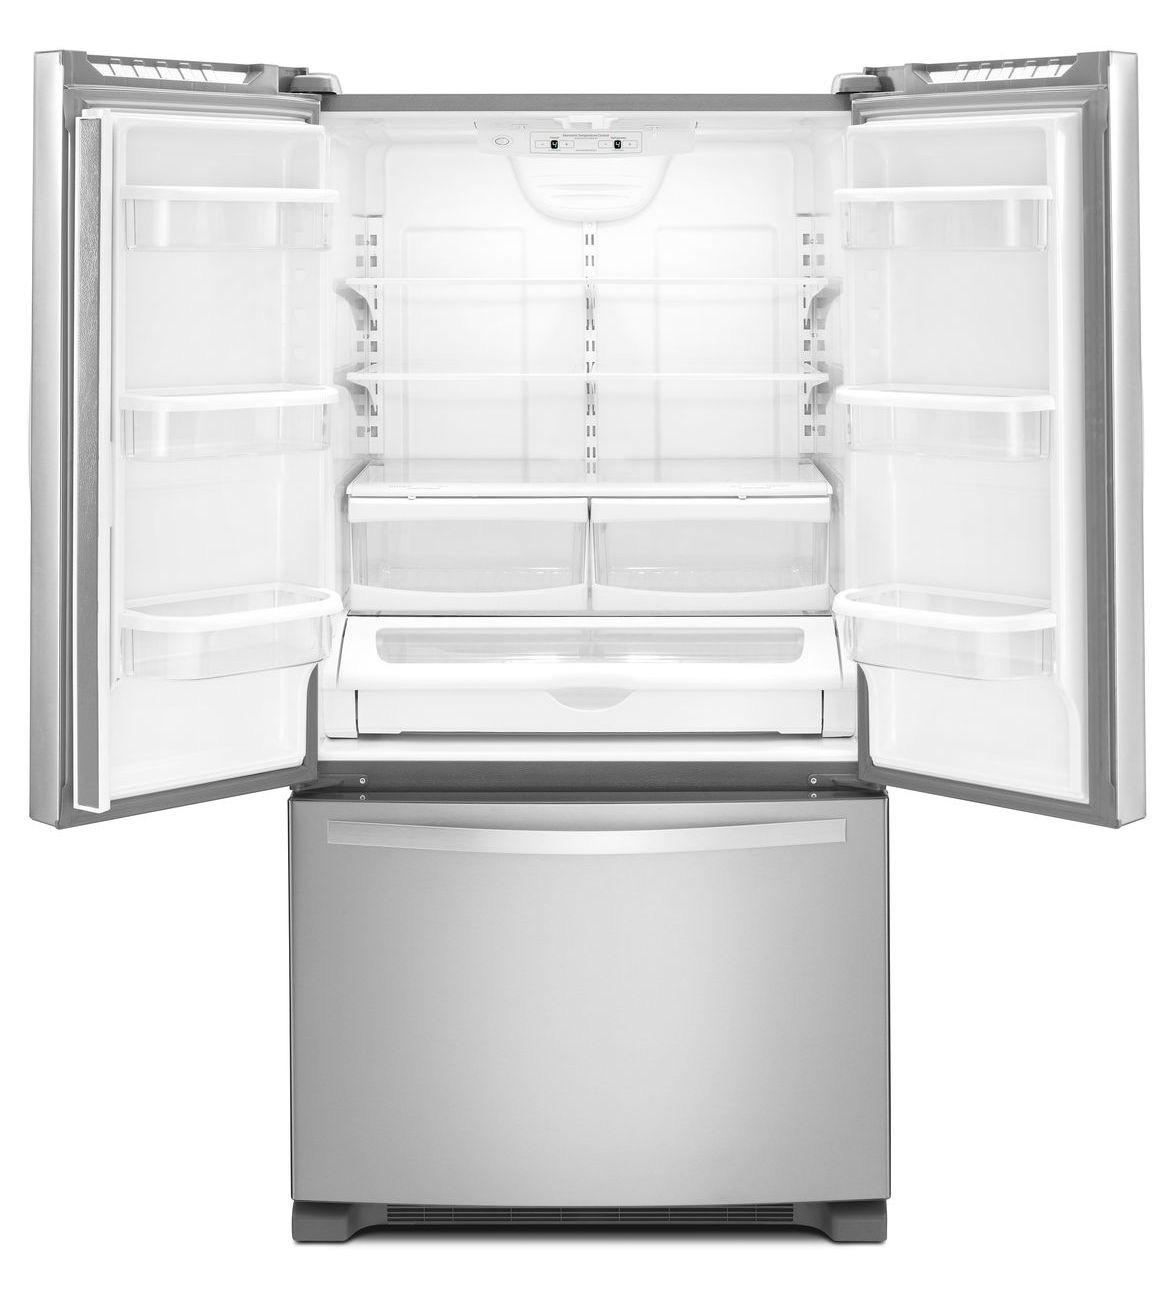 Whirlpool white ice counter depth french door - Whirlpool Wrf532smbw French Door Refrigerators Main Image Interior